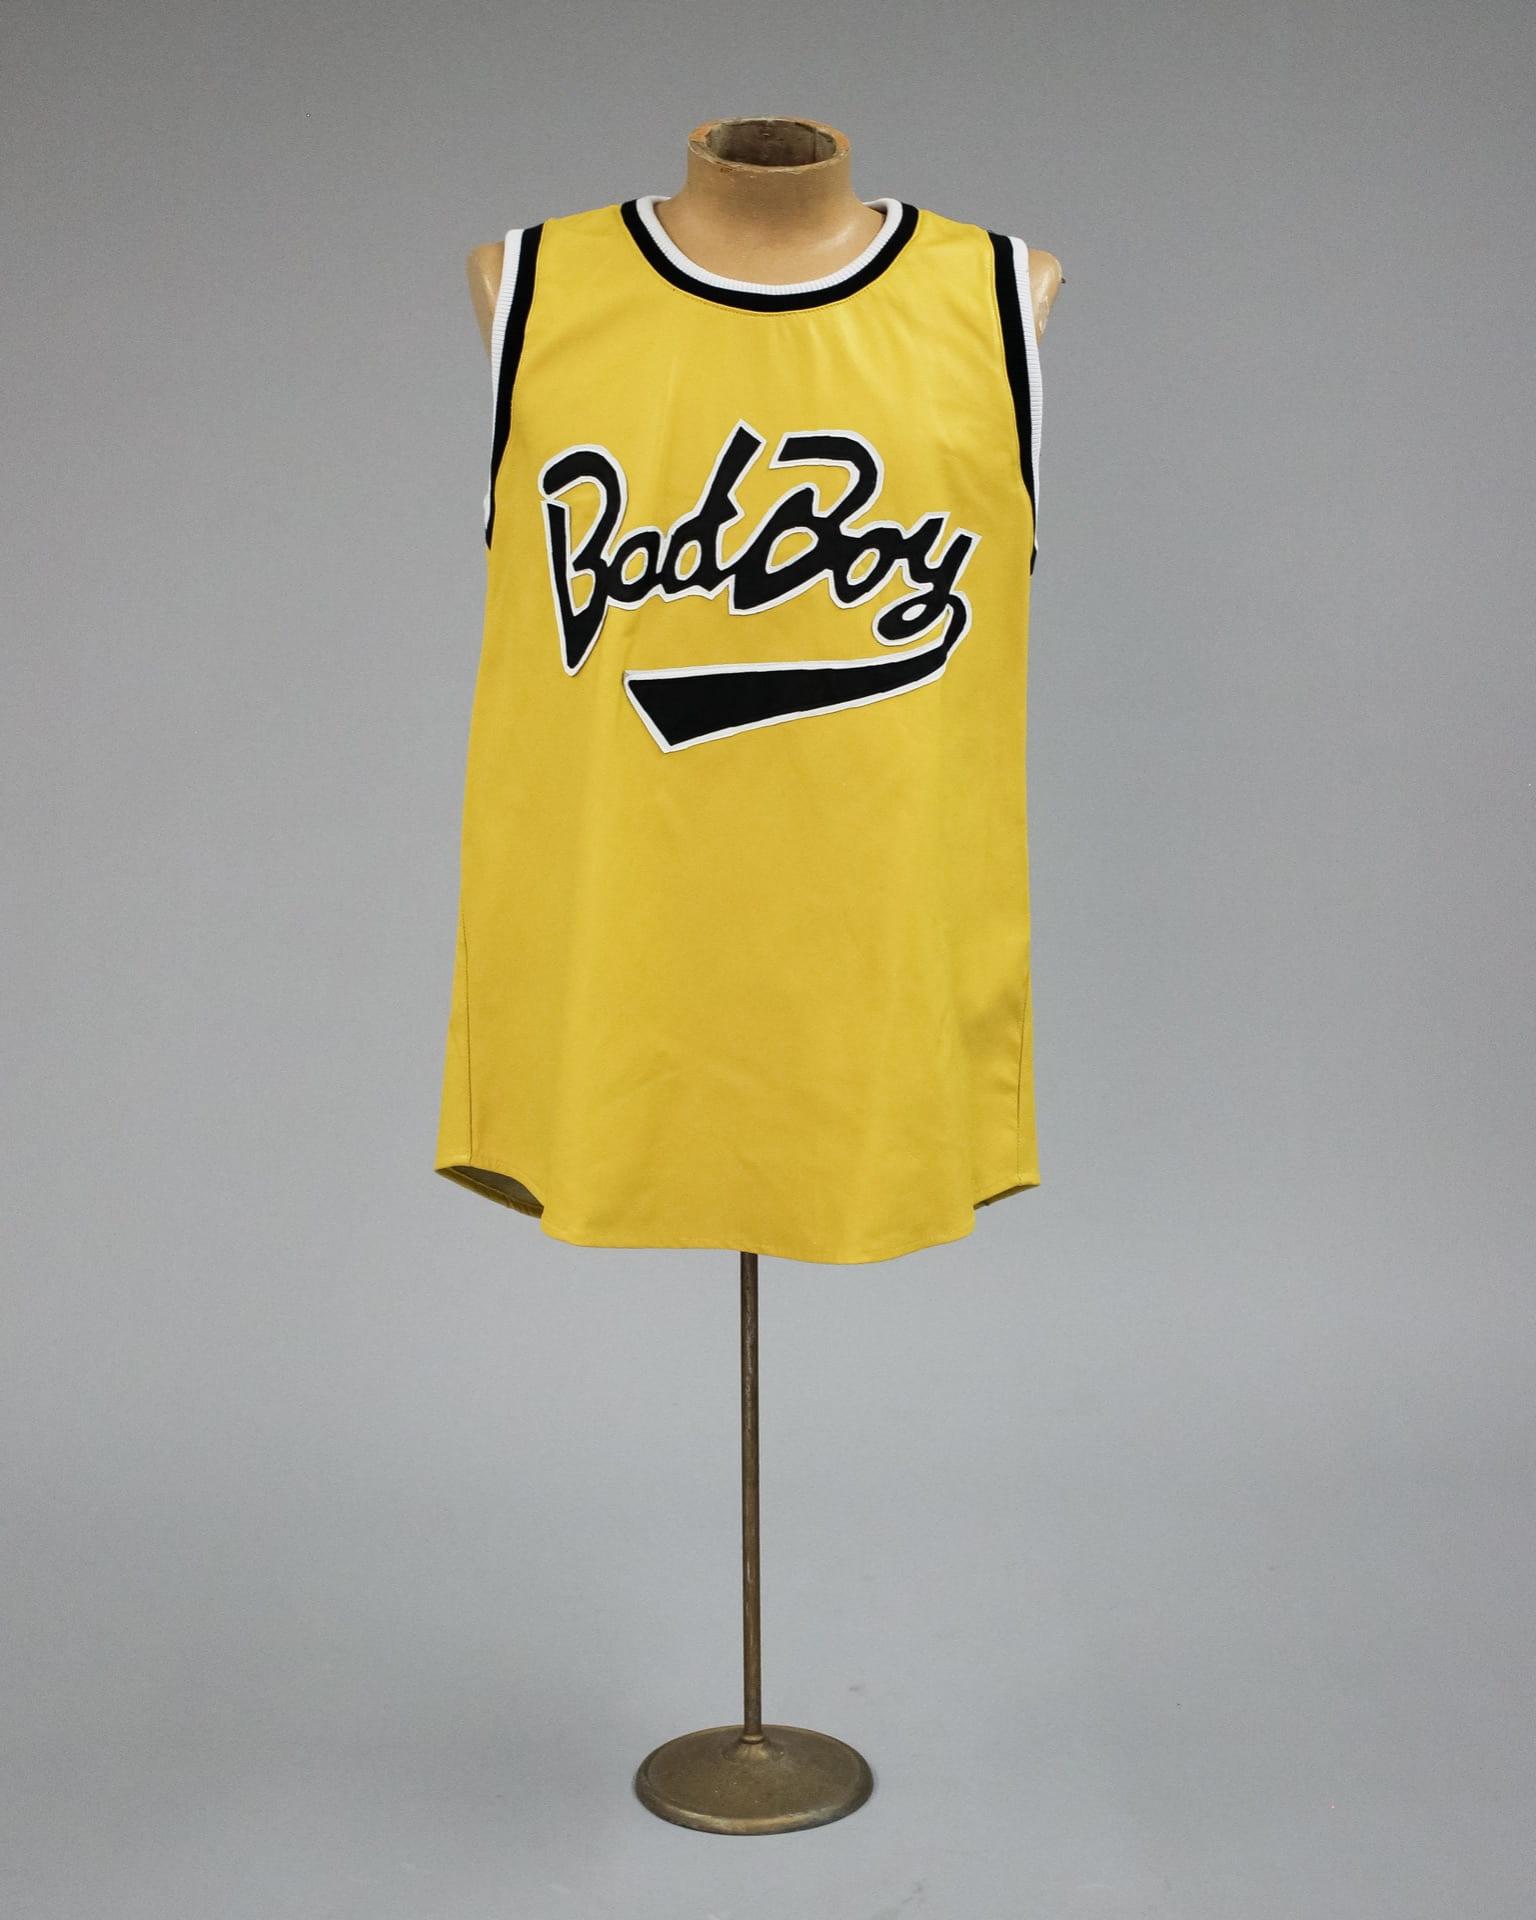 Bad boy jersey